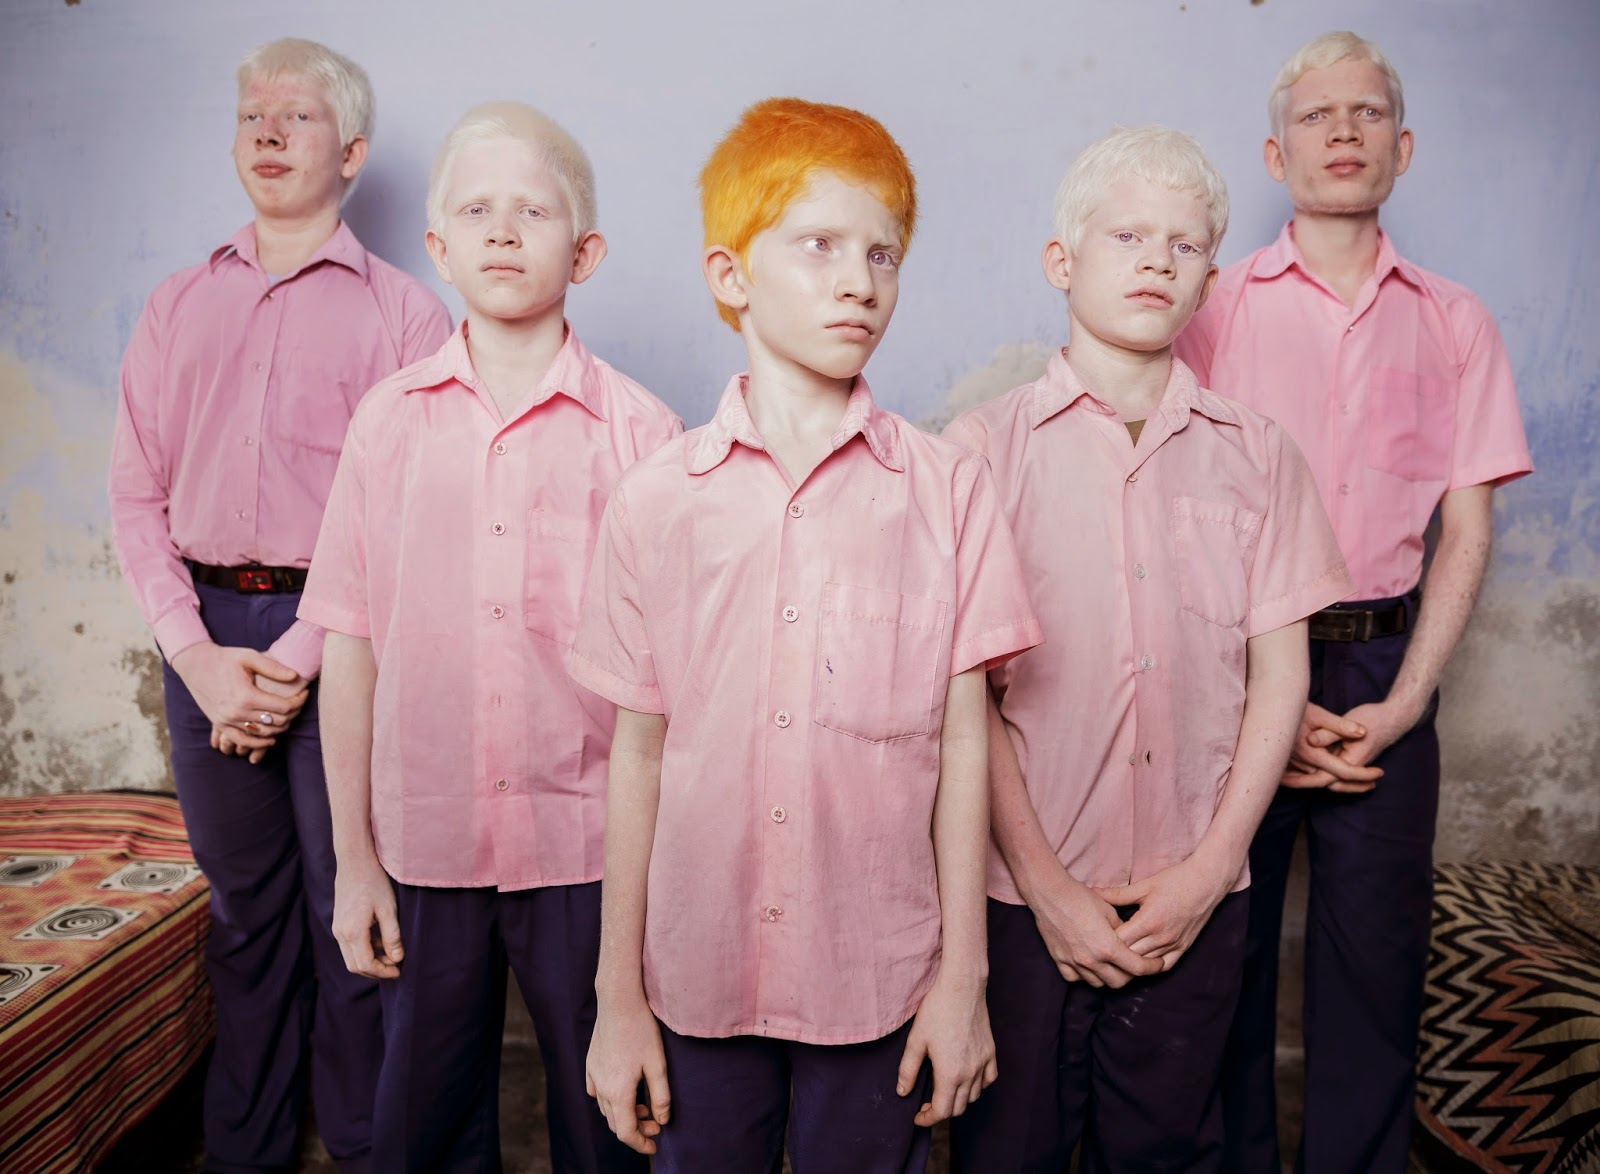 16_Brent Stirton.jpg